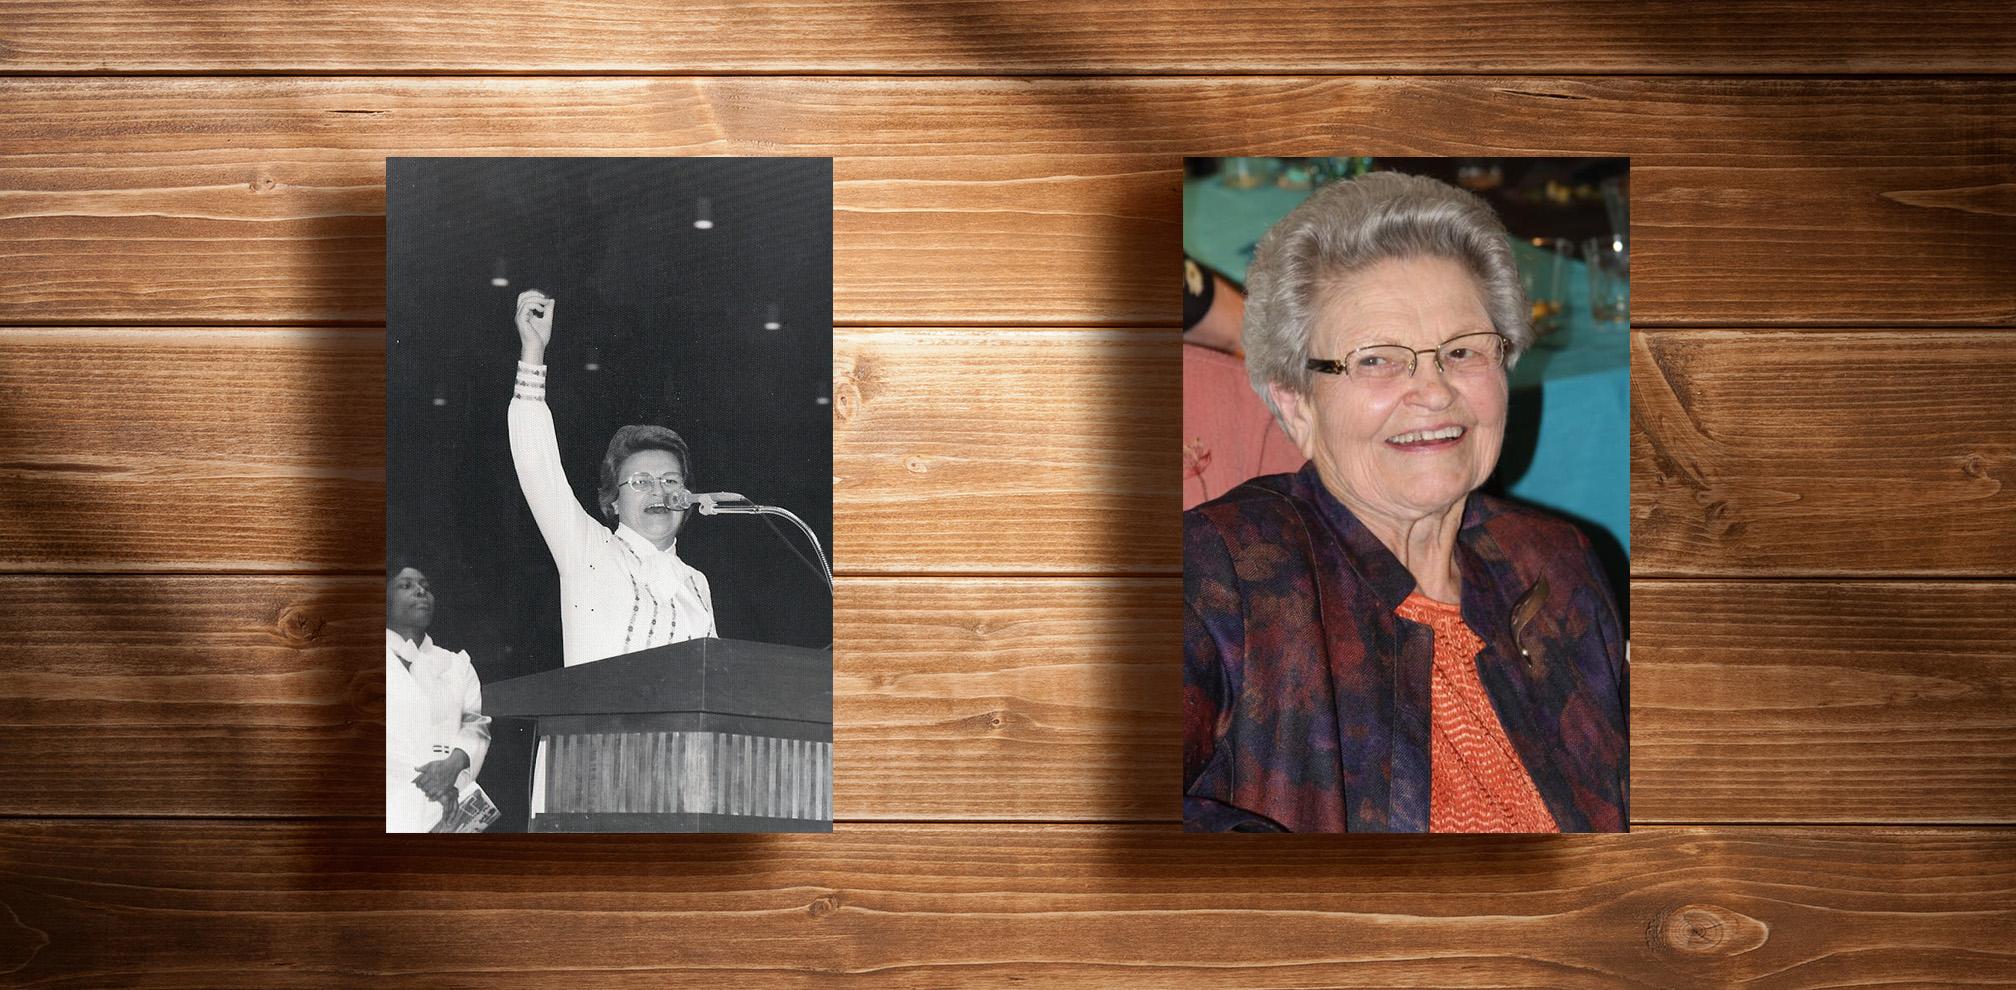 ELVA HOWARD WOMEN IN LEADERSHIP SCHOLARSHIP ANNOUNCED